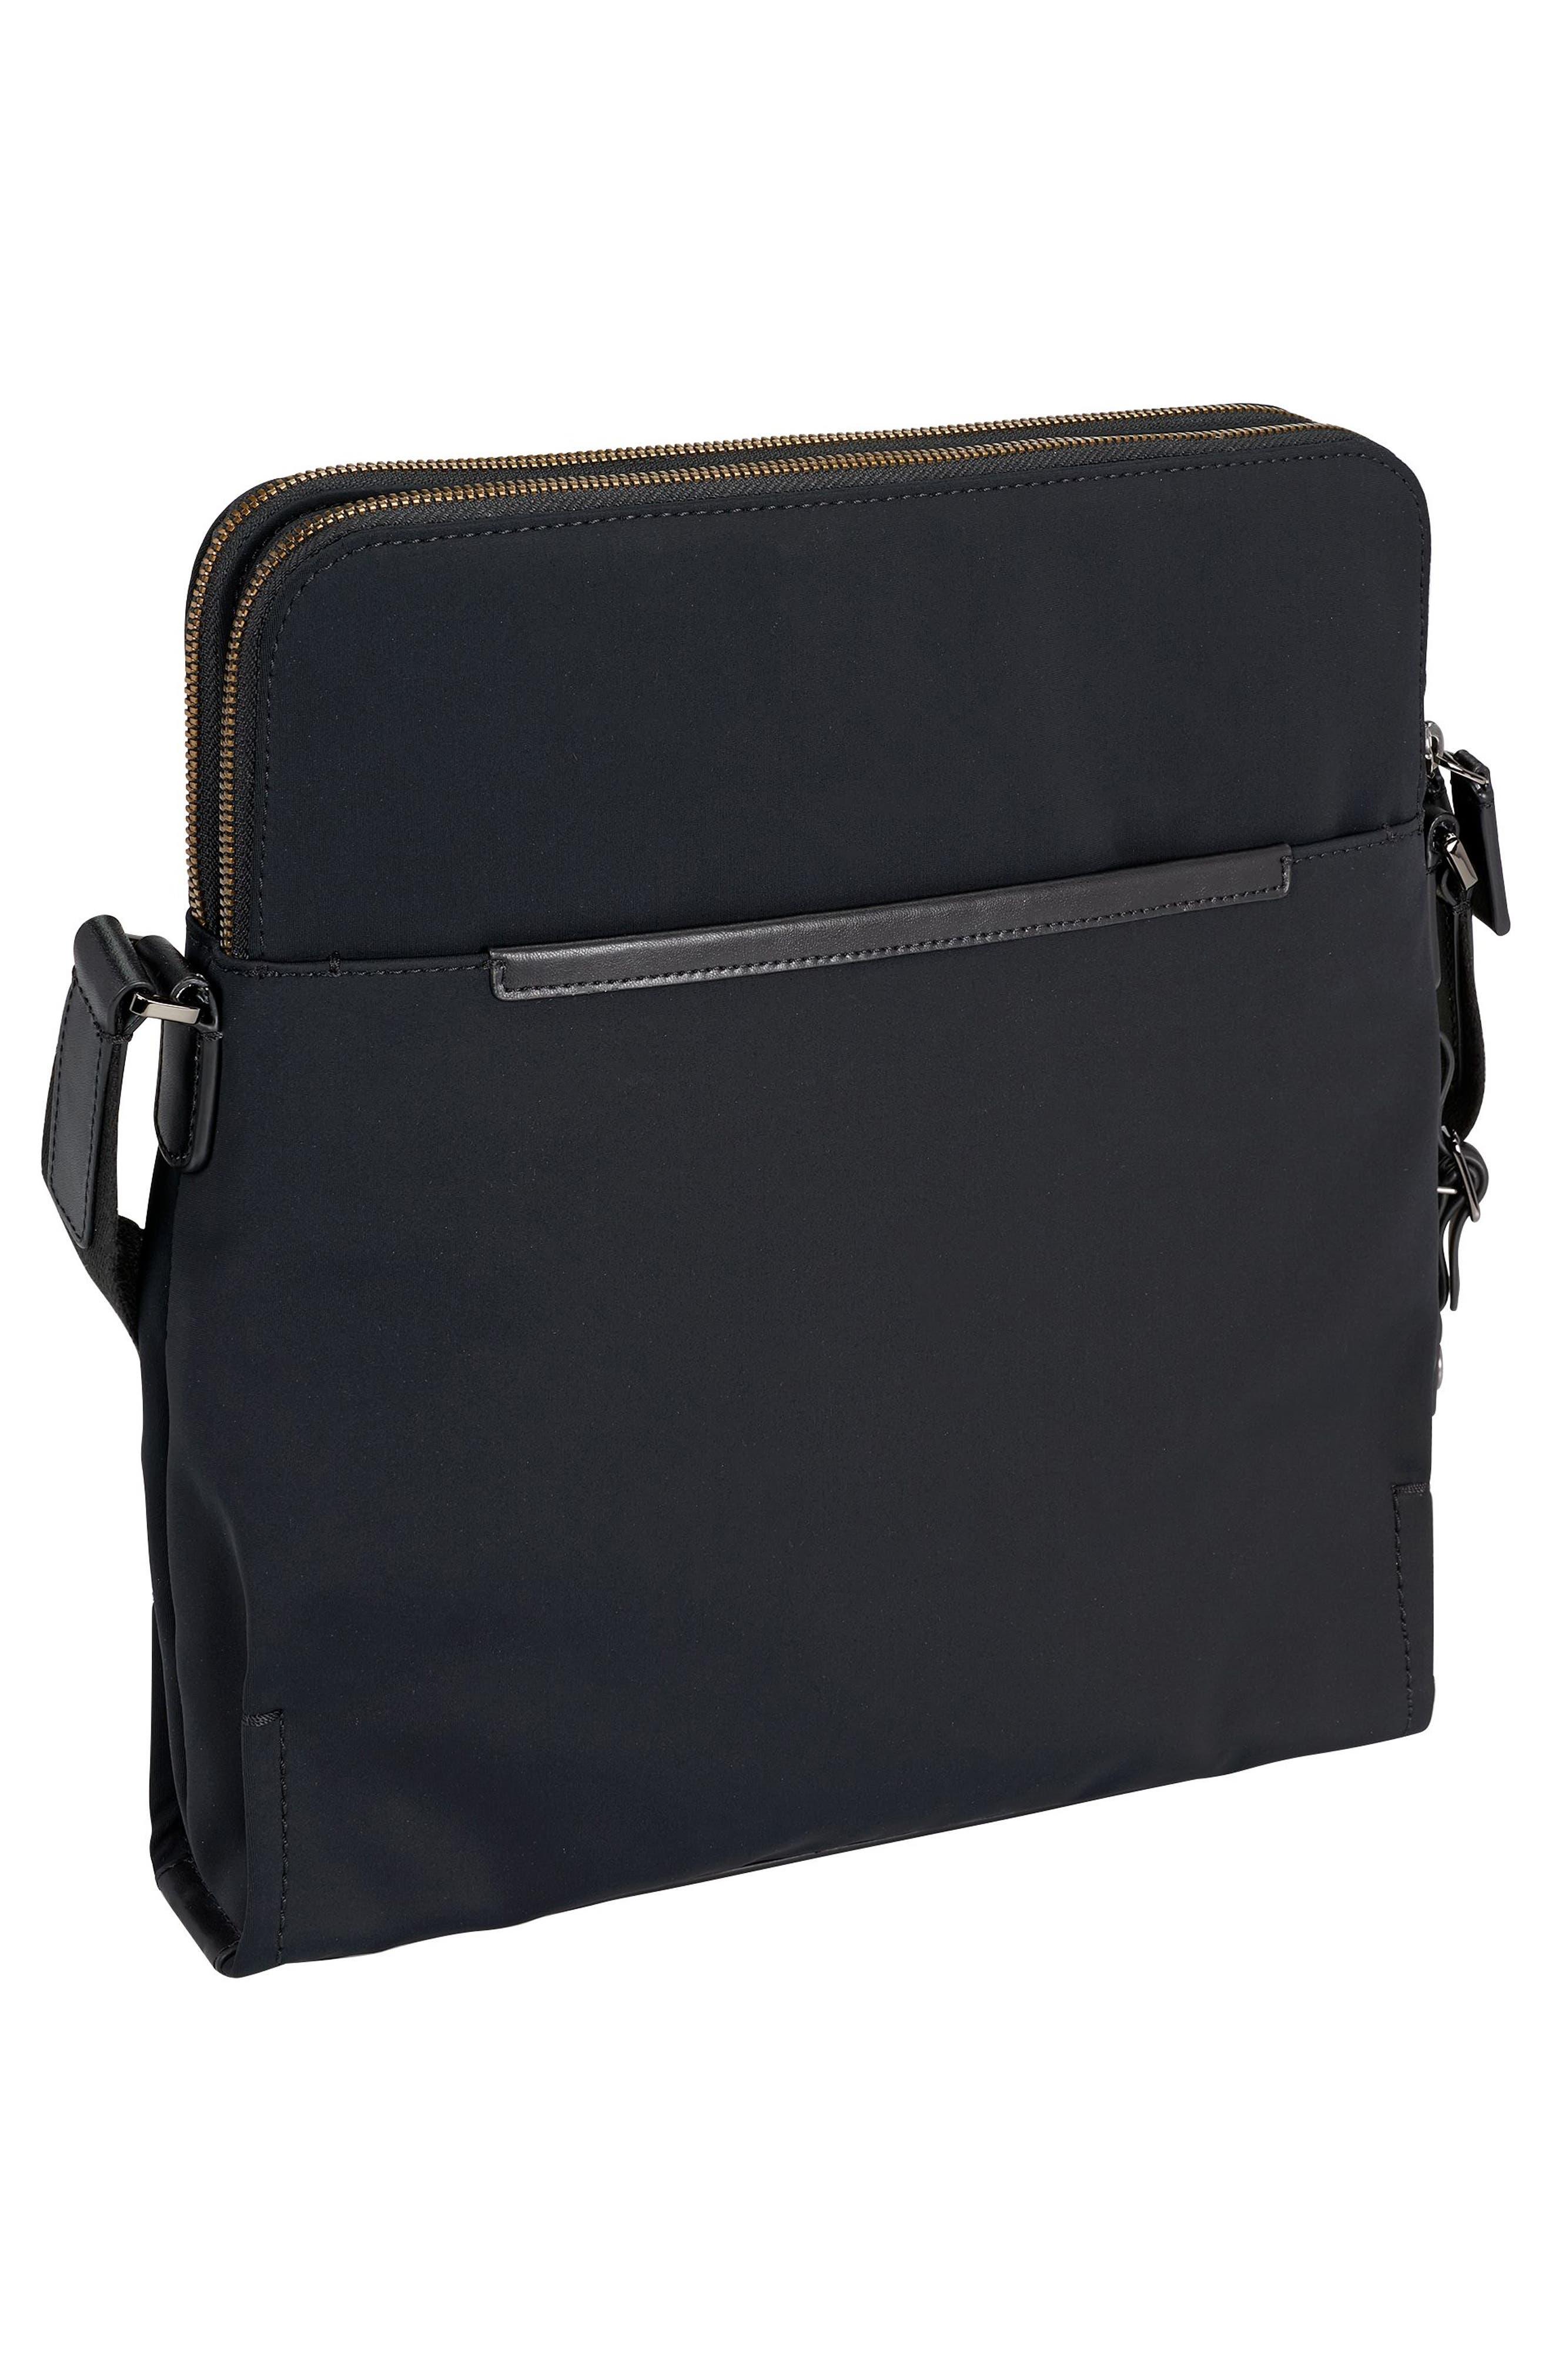 Harrison Stratton Messenger Bag,                             Alternate thumbnail 6, color,                             Black Nylon